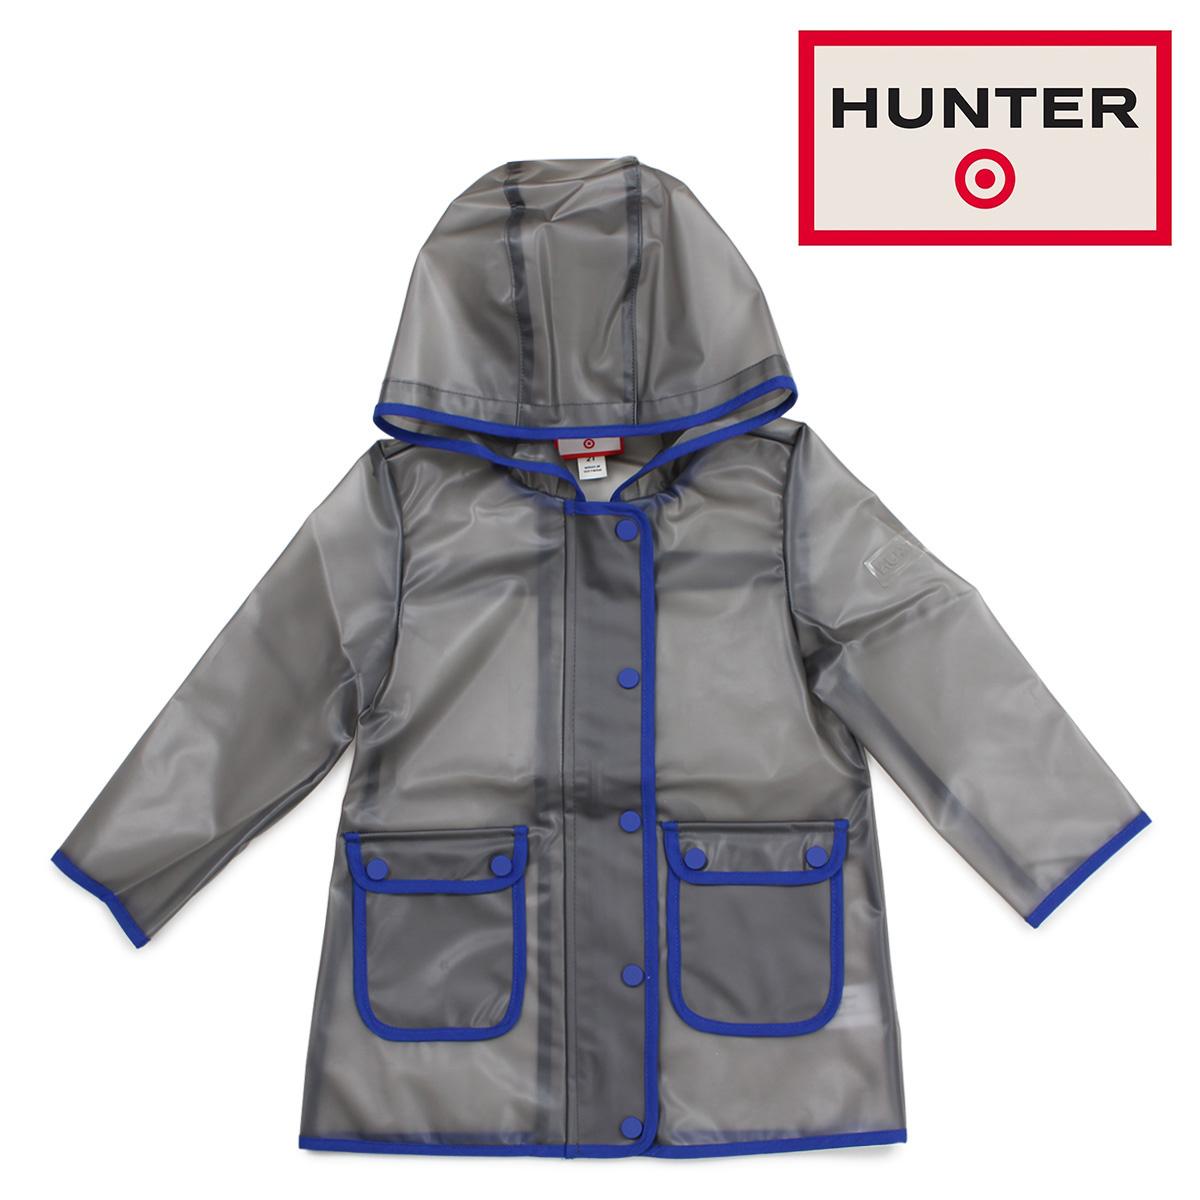 3b5b2128d34a target raincoats for kids - Ecosia